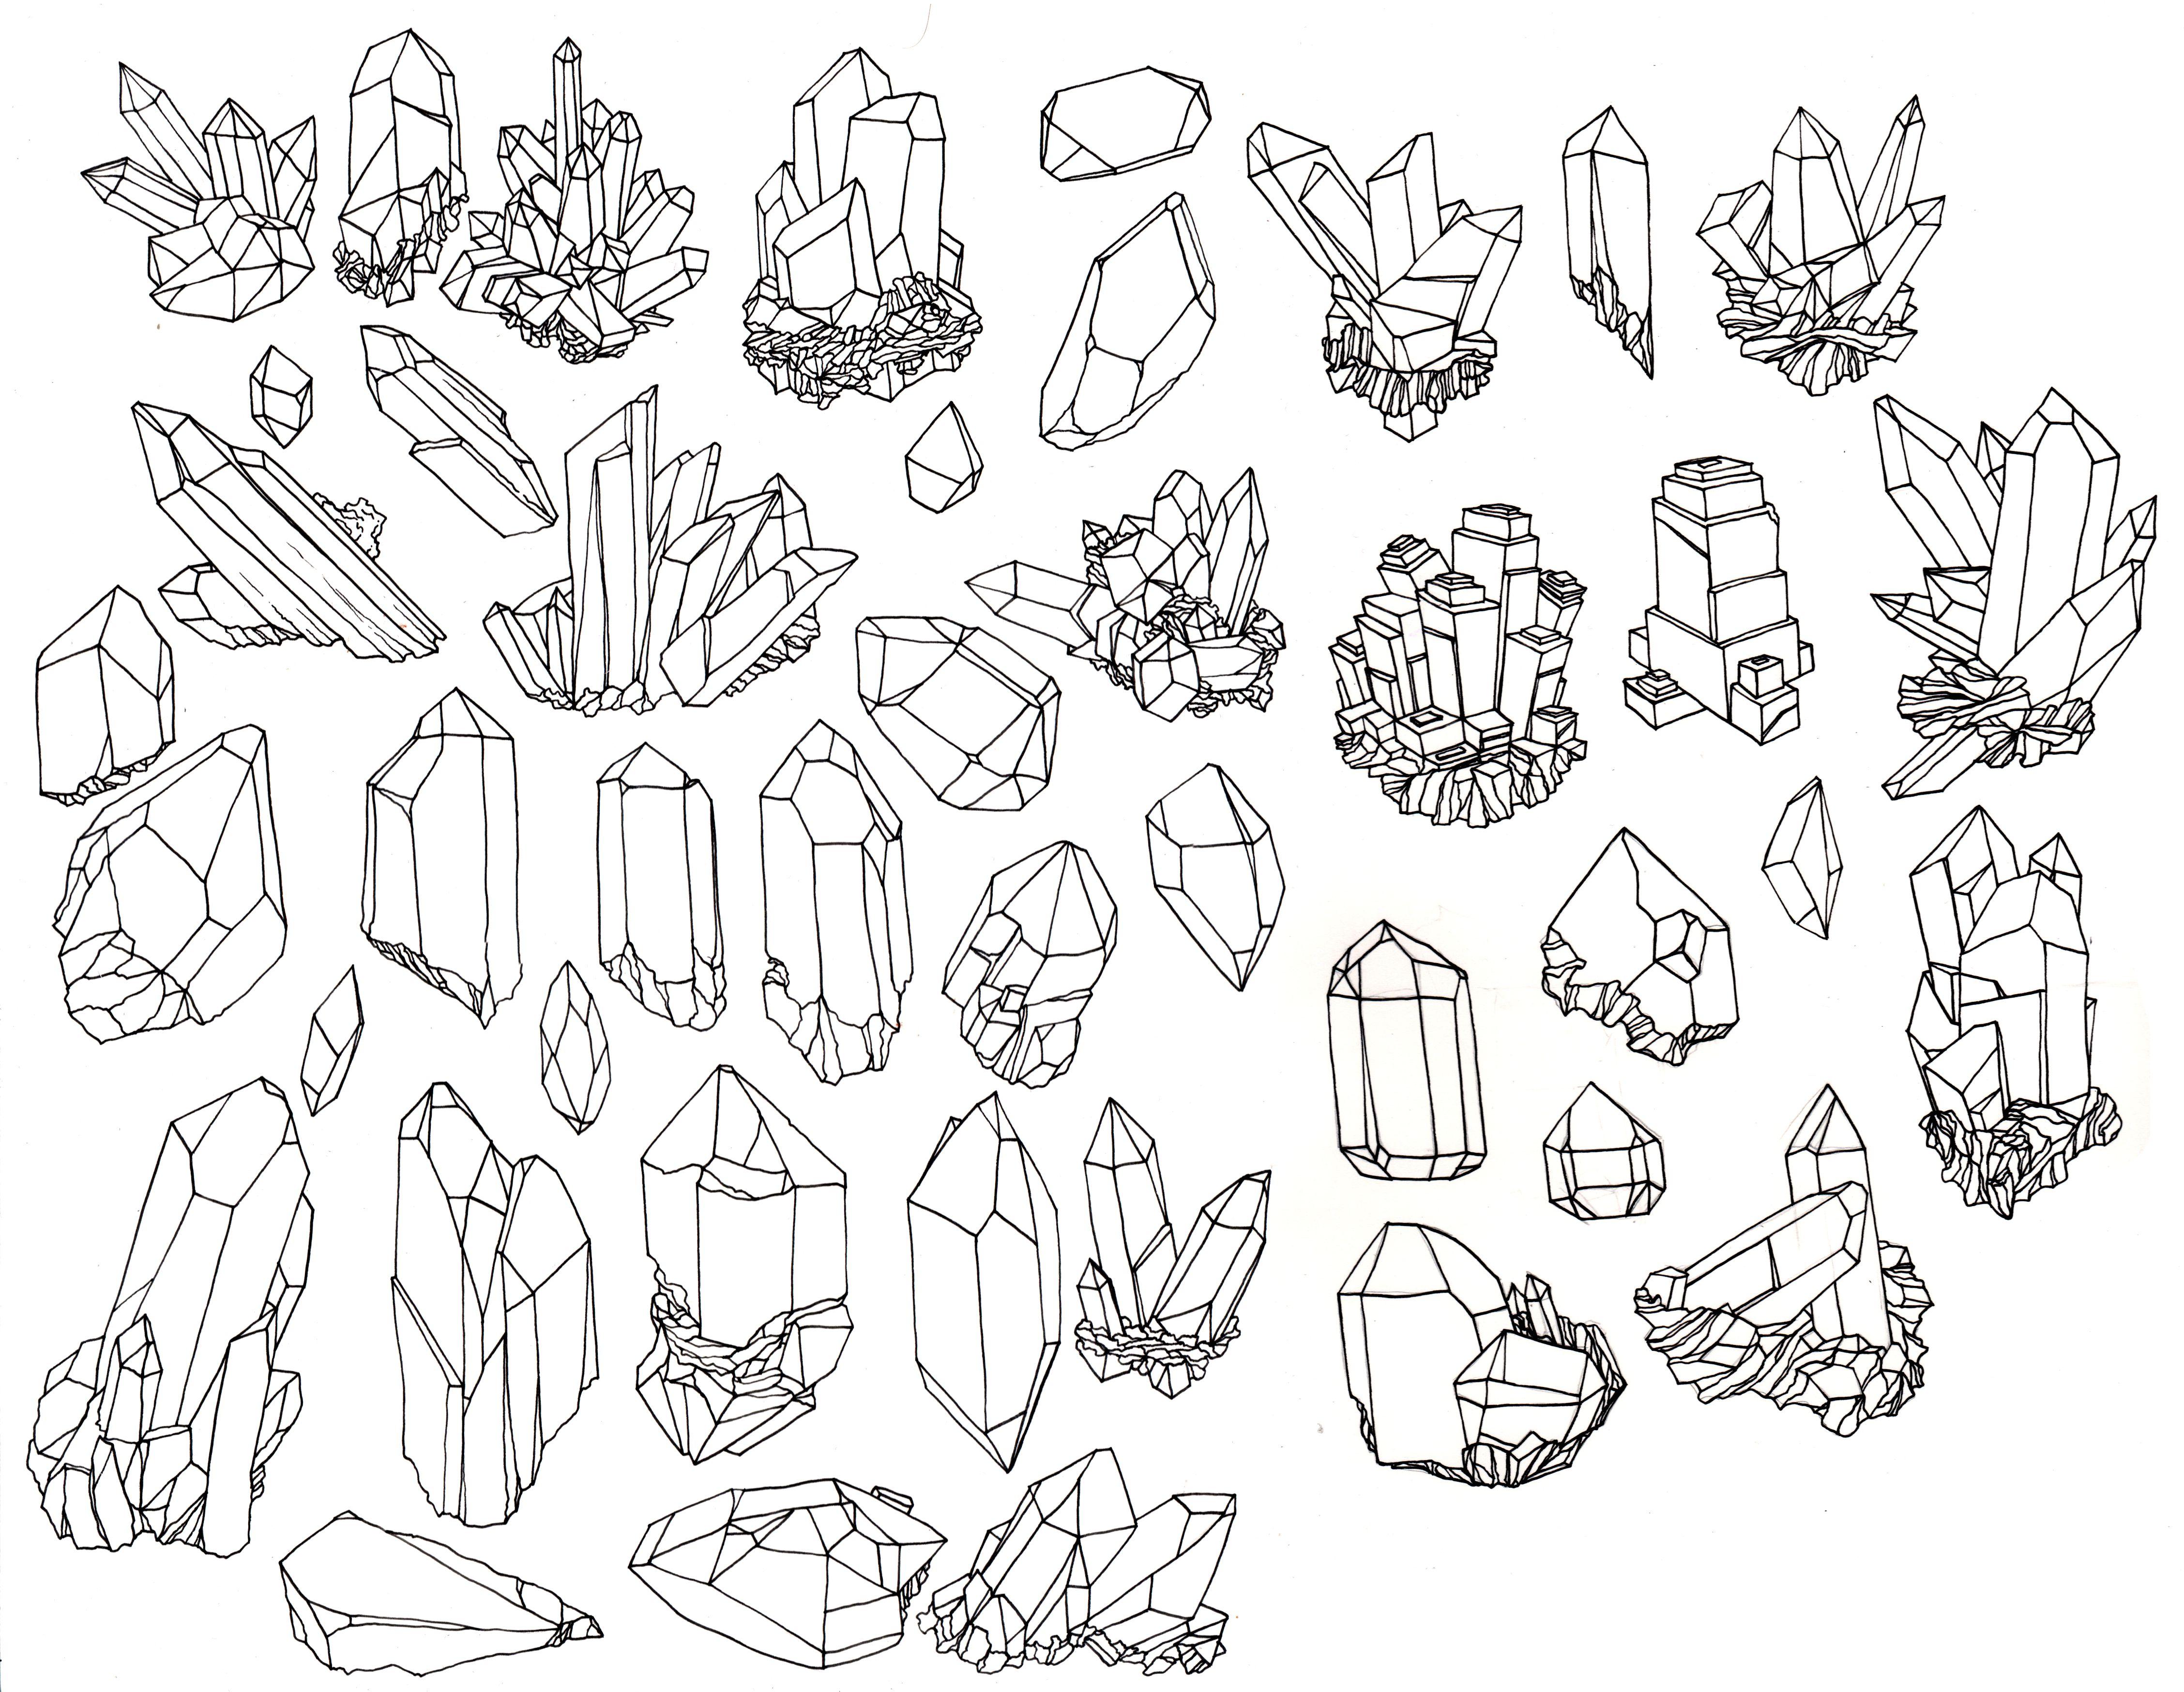 vintage crystal illustration - Google Search | Paint, Pens ...